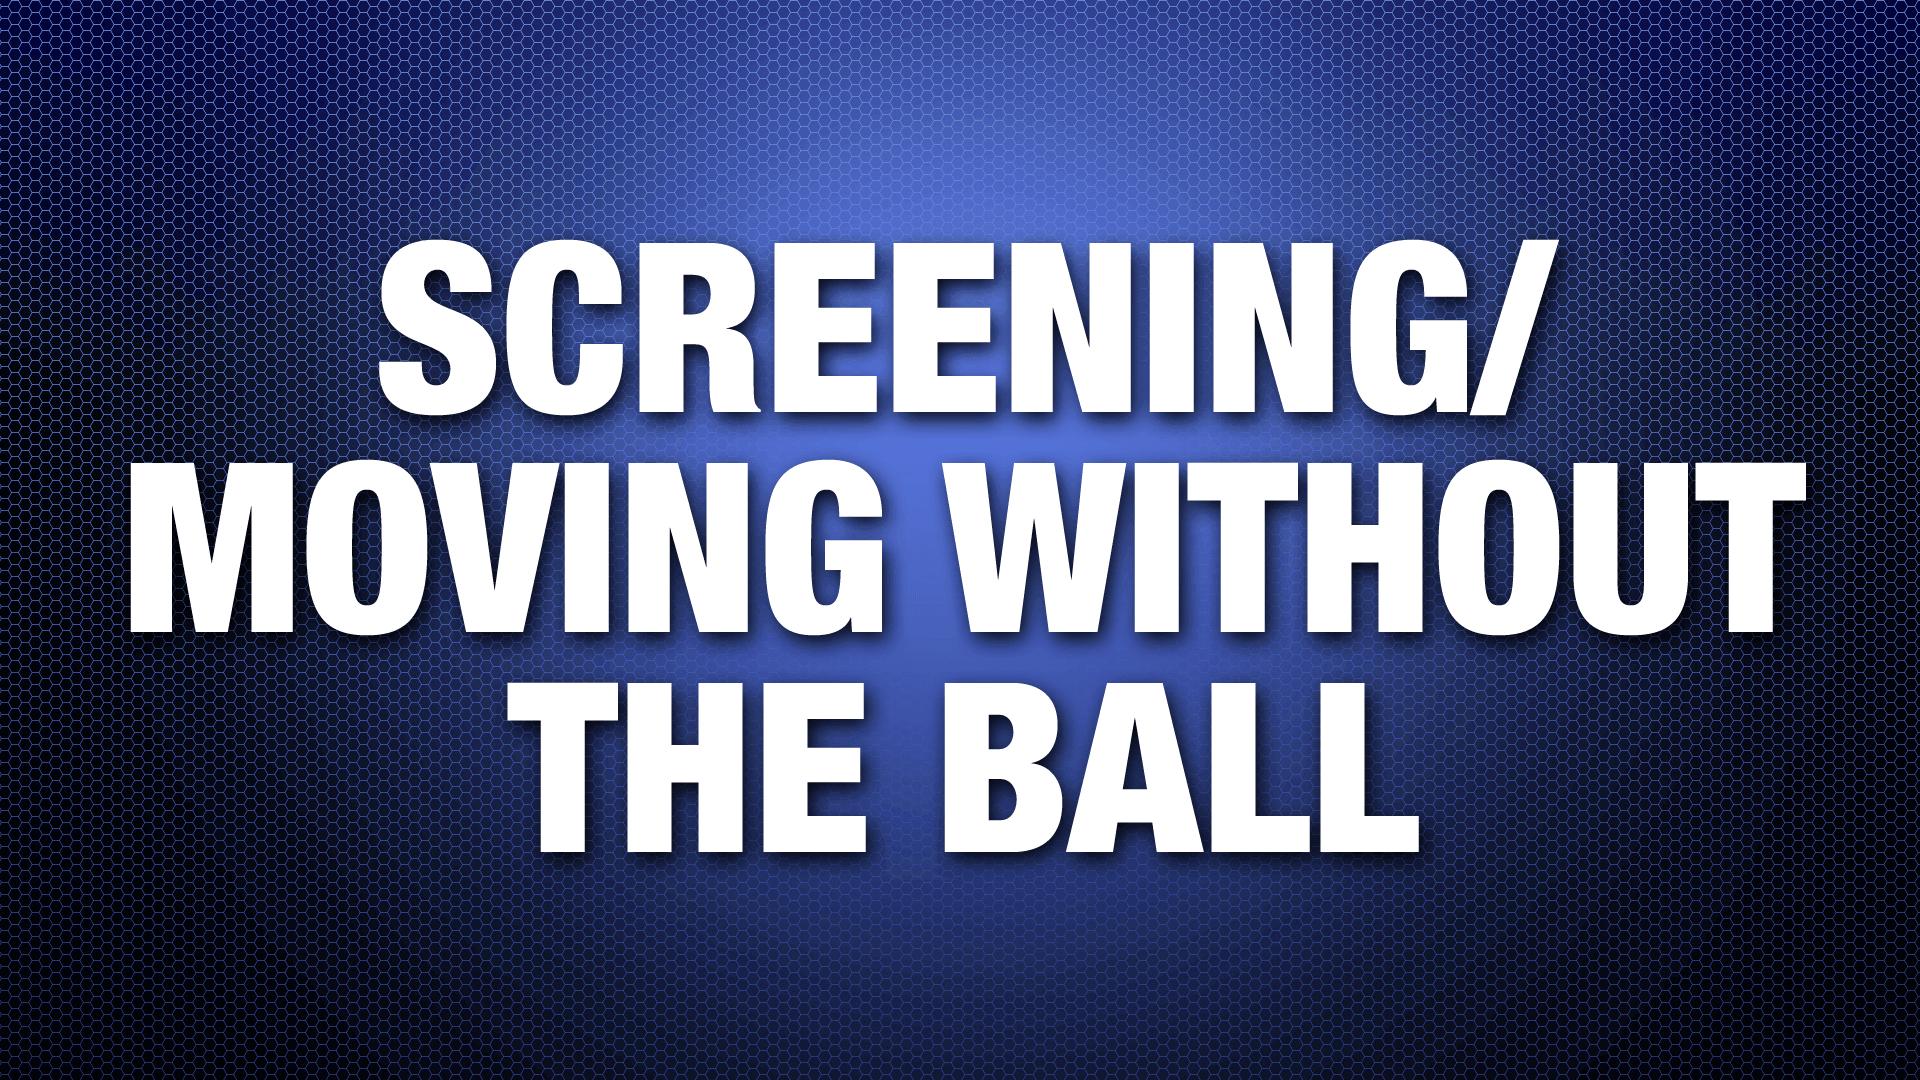 ScreeningMovingWithoutBall